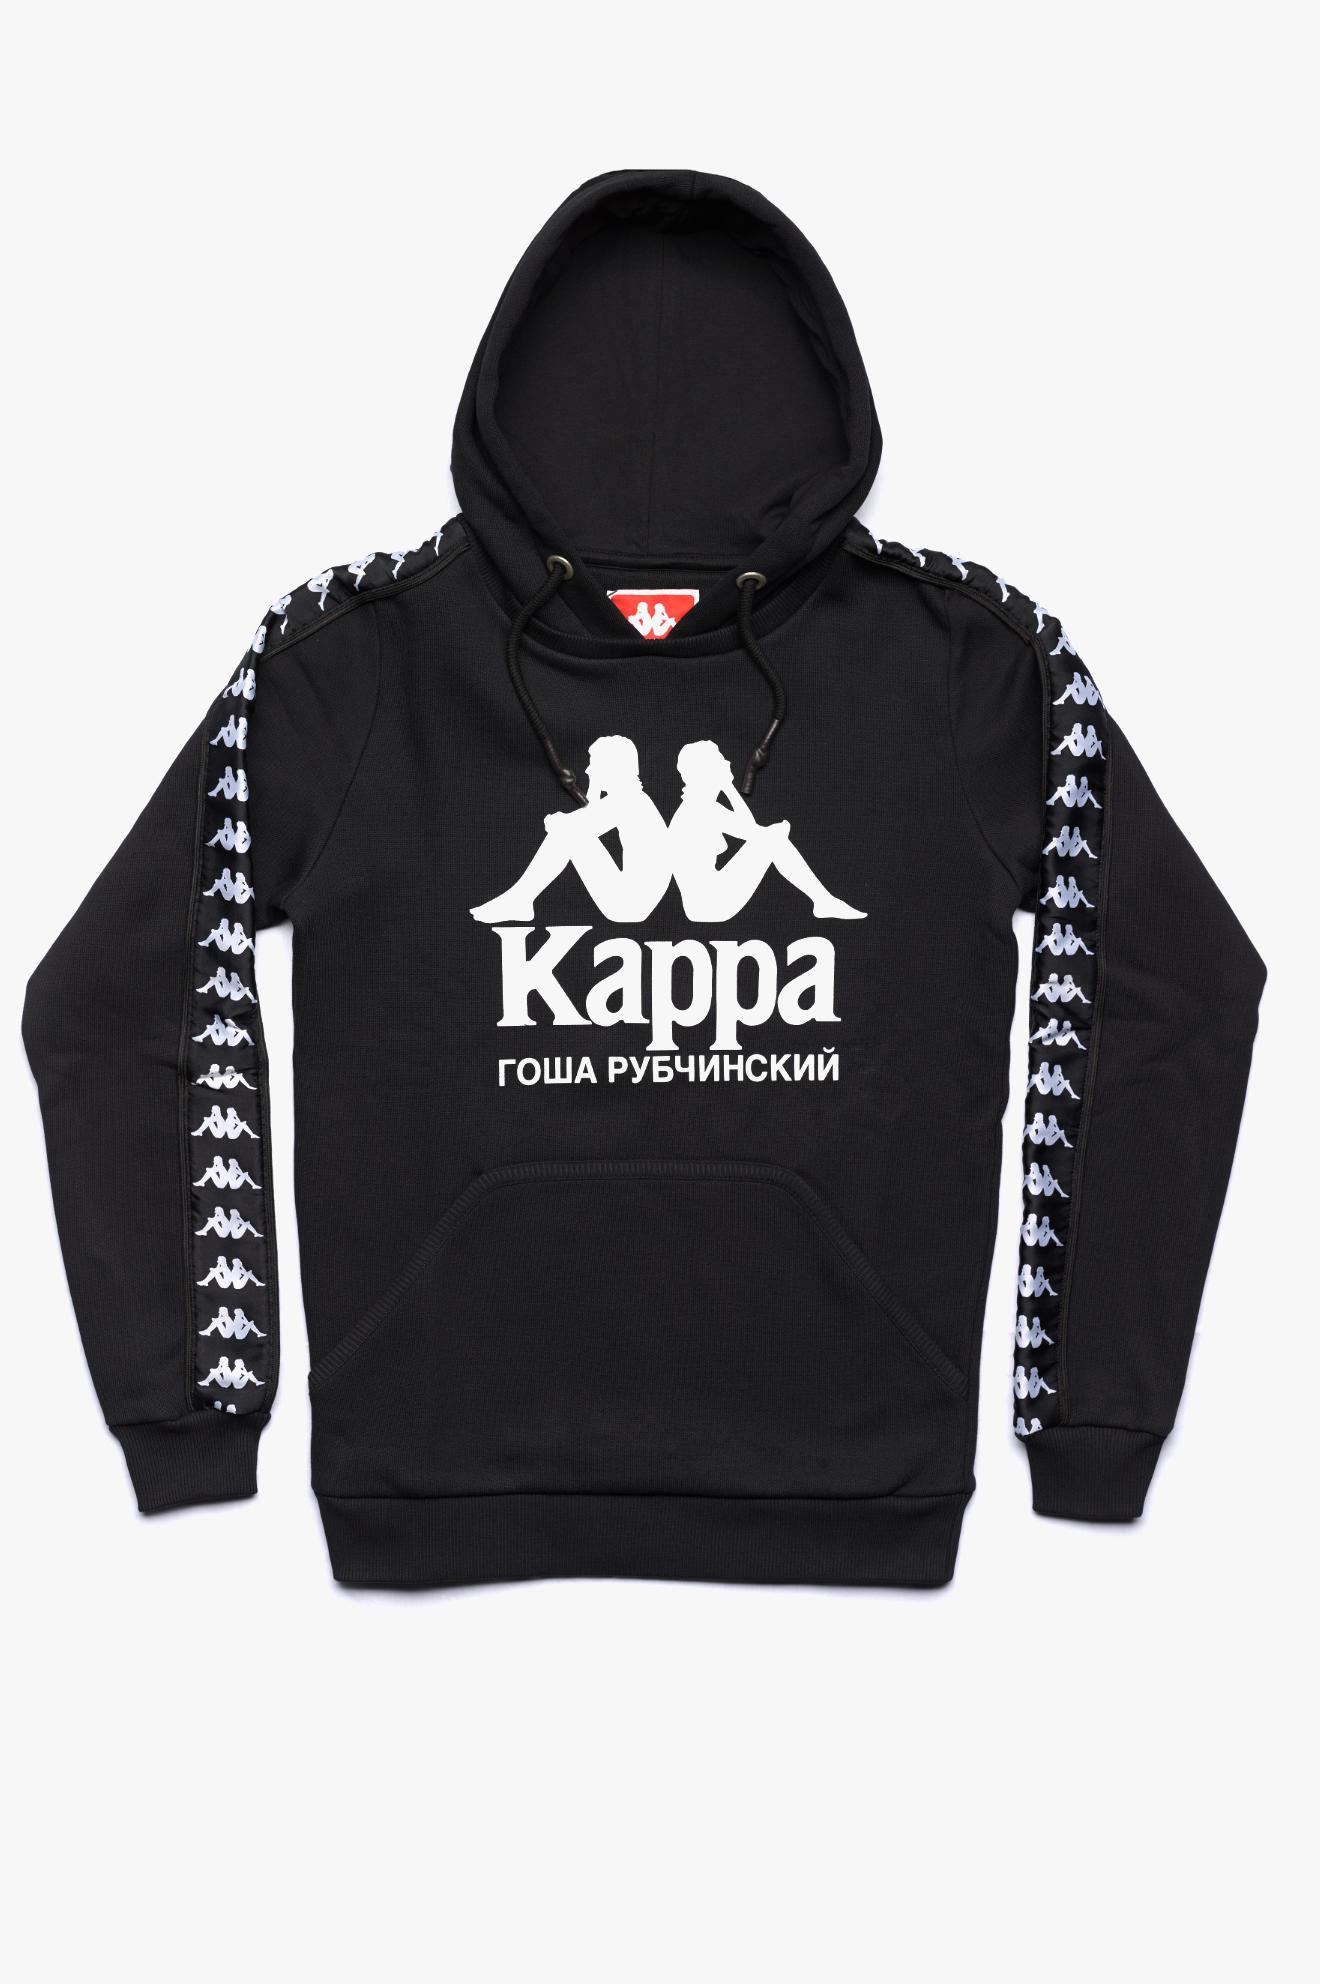 Kappa Hooded Sweatshirt Black